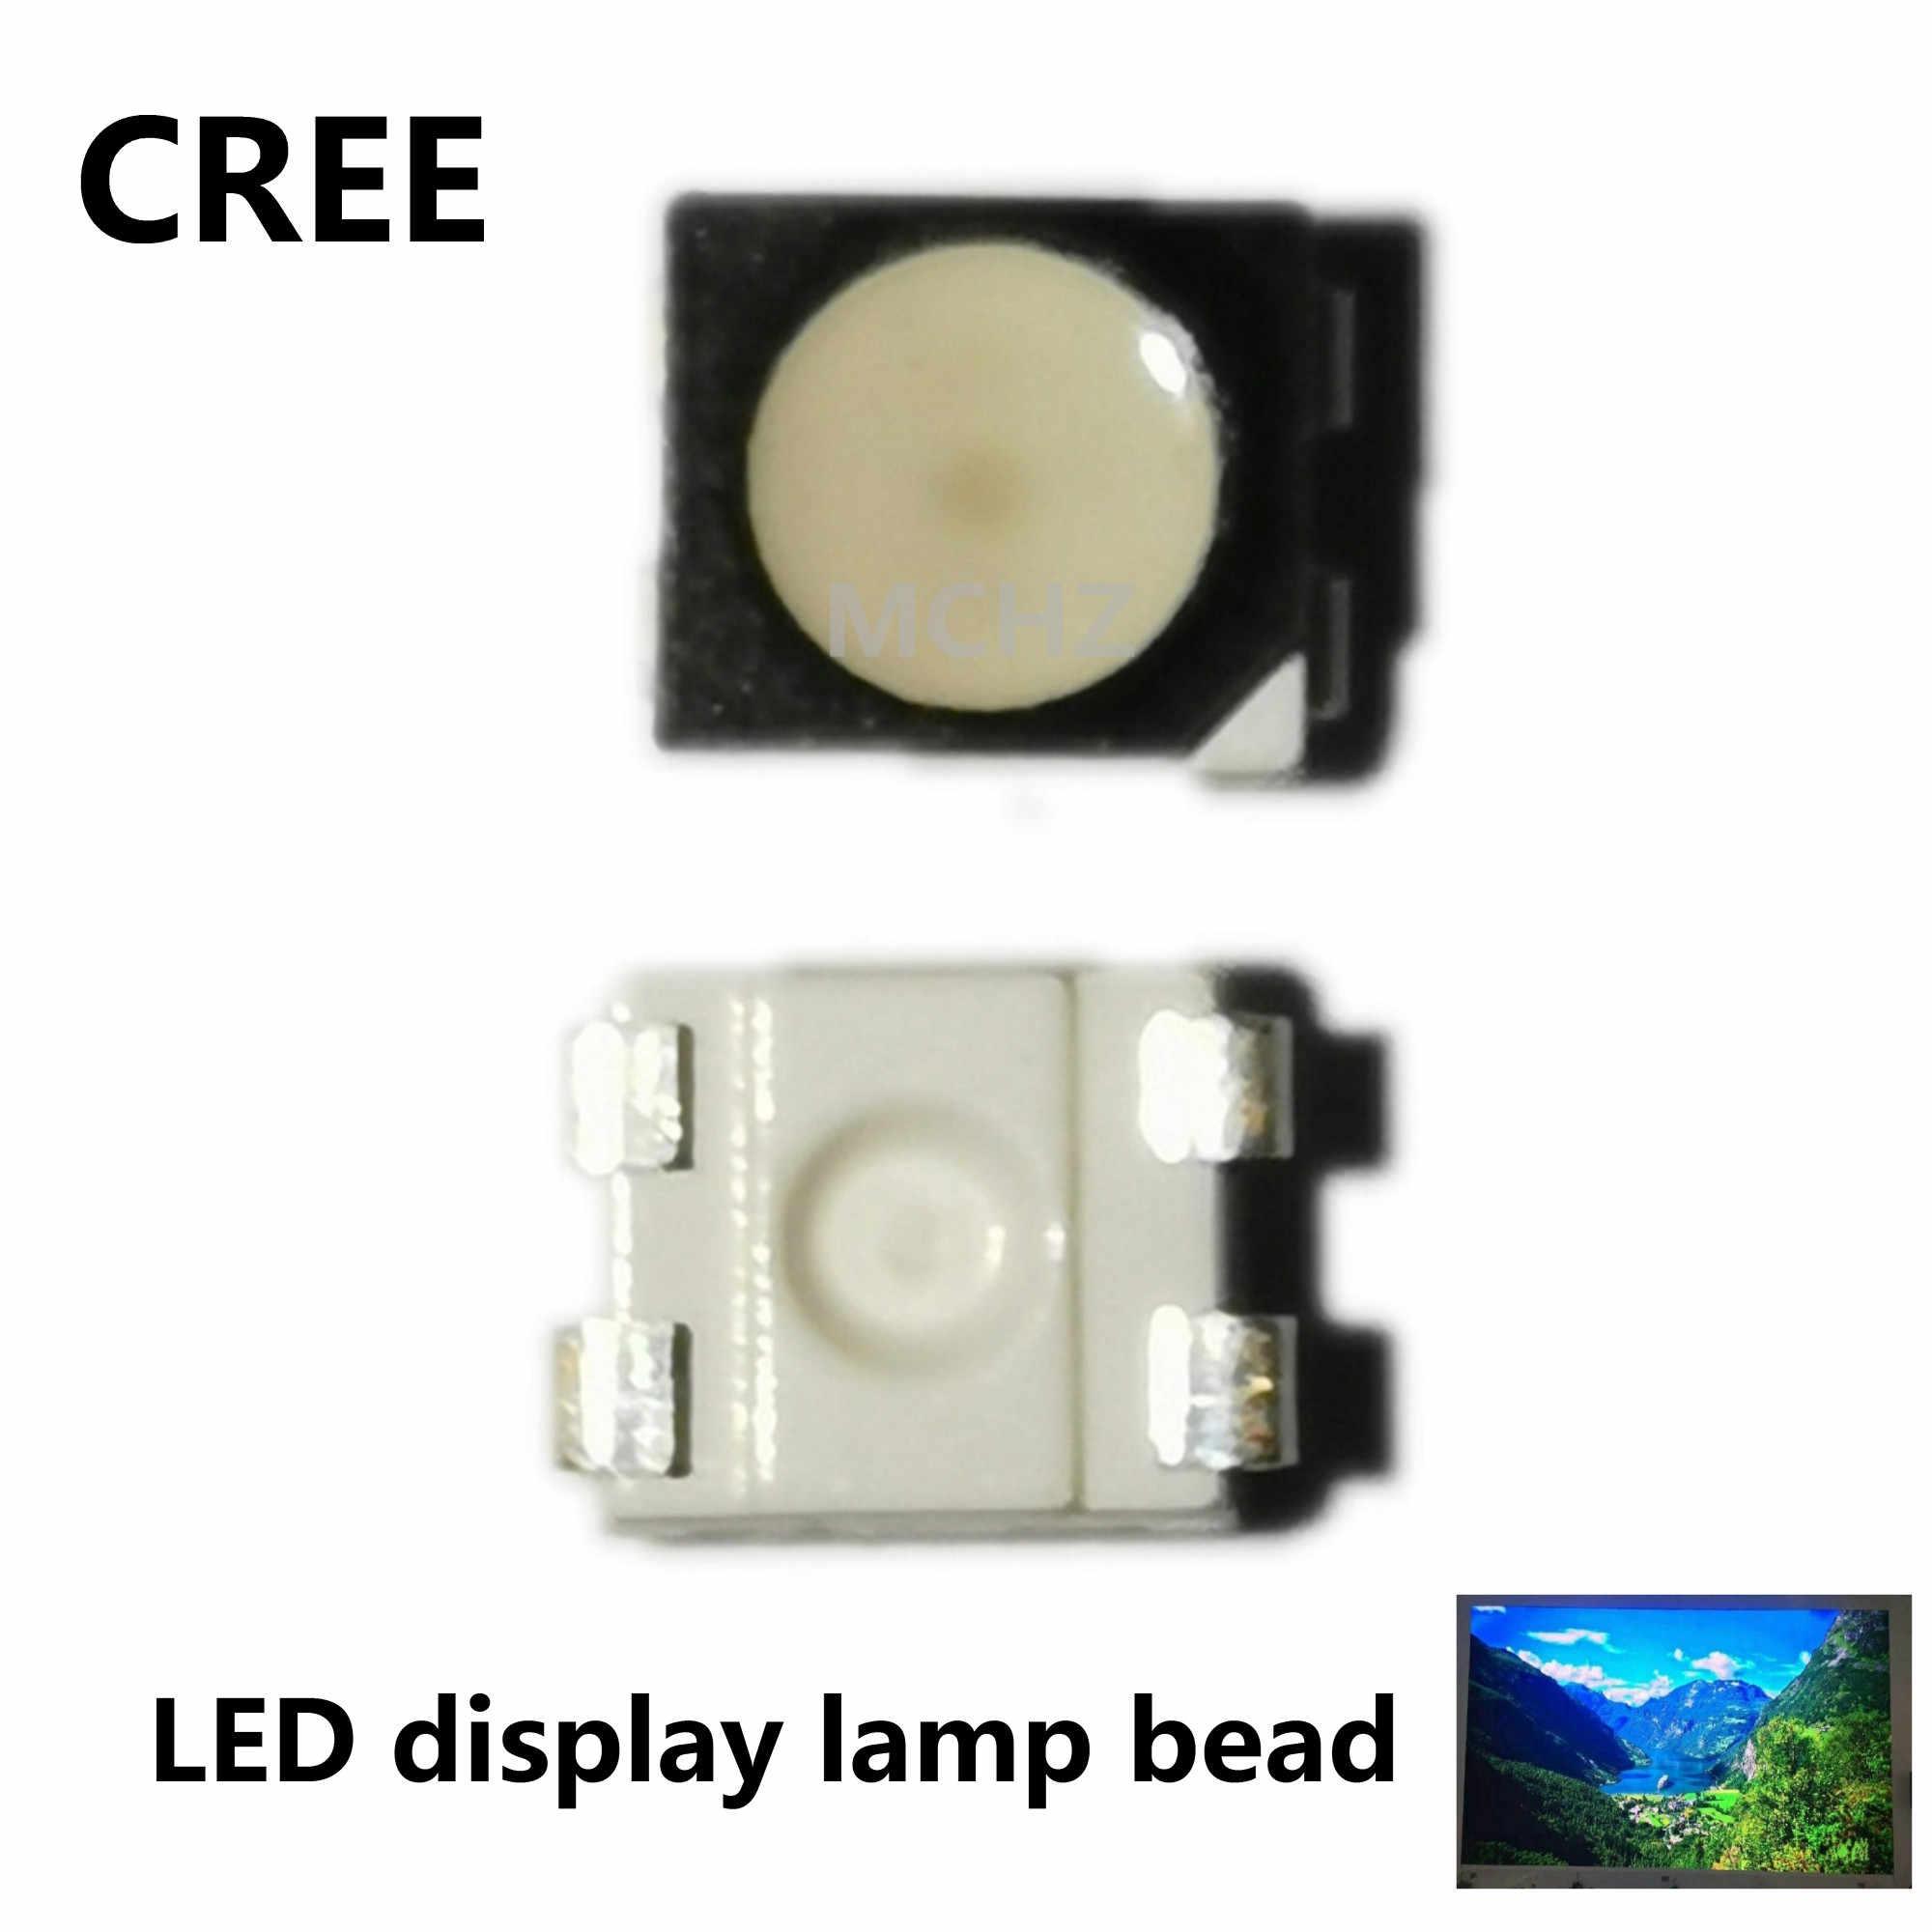 500Pcs Smd Smt 3528 Super Bright Yellow Led Lamp Bulb ab